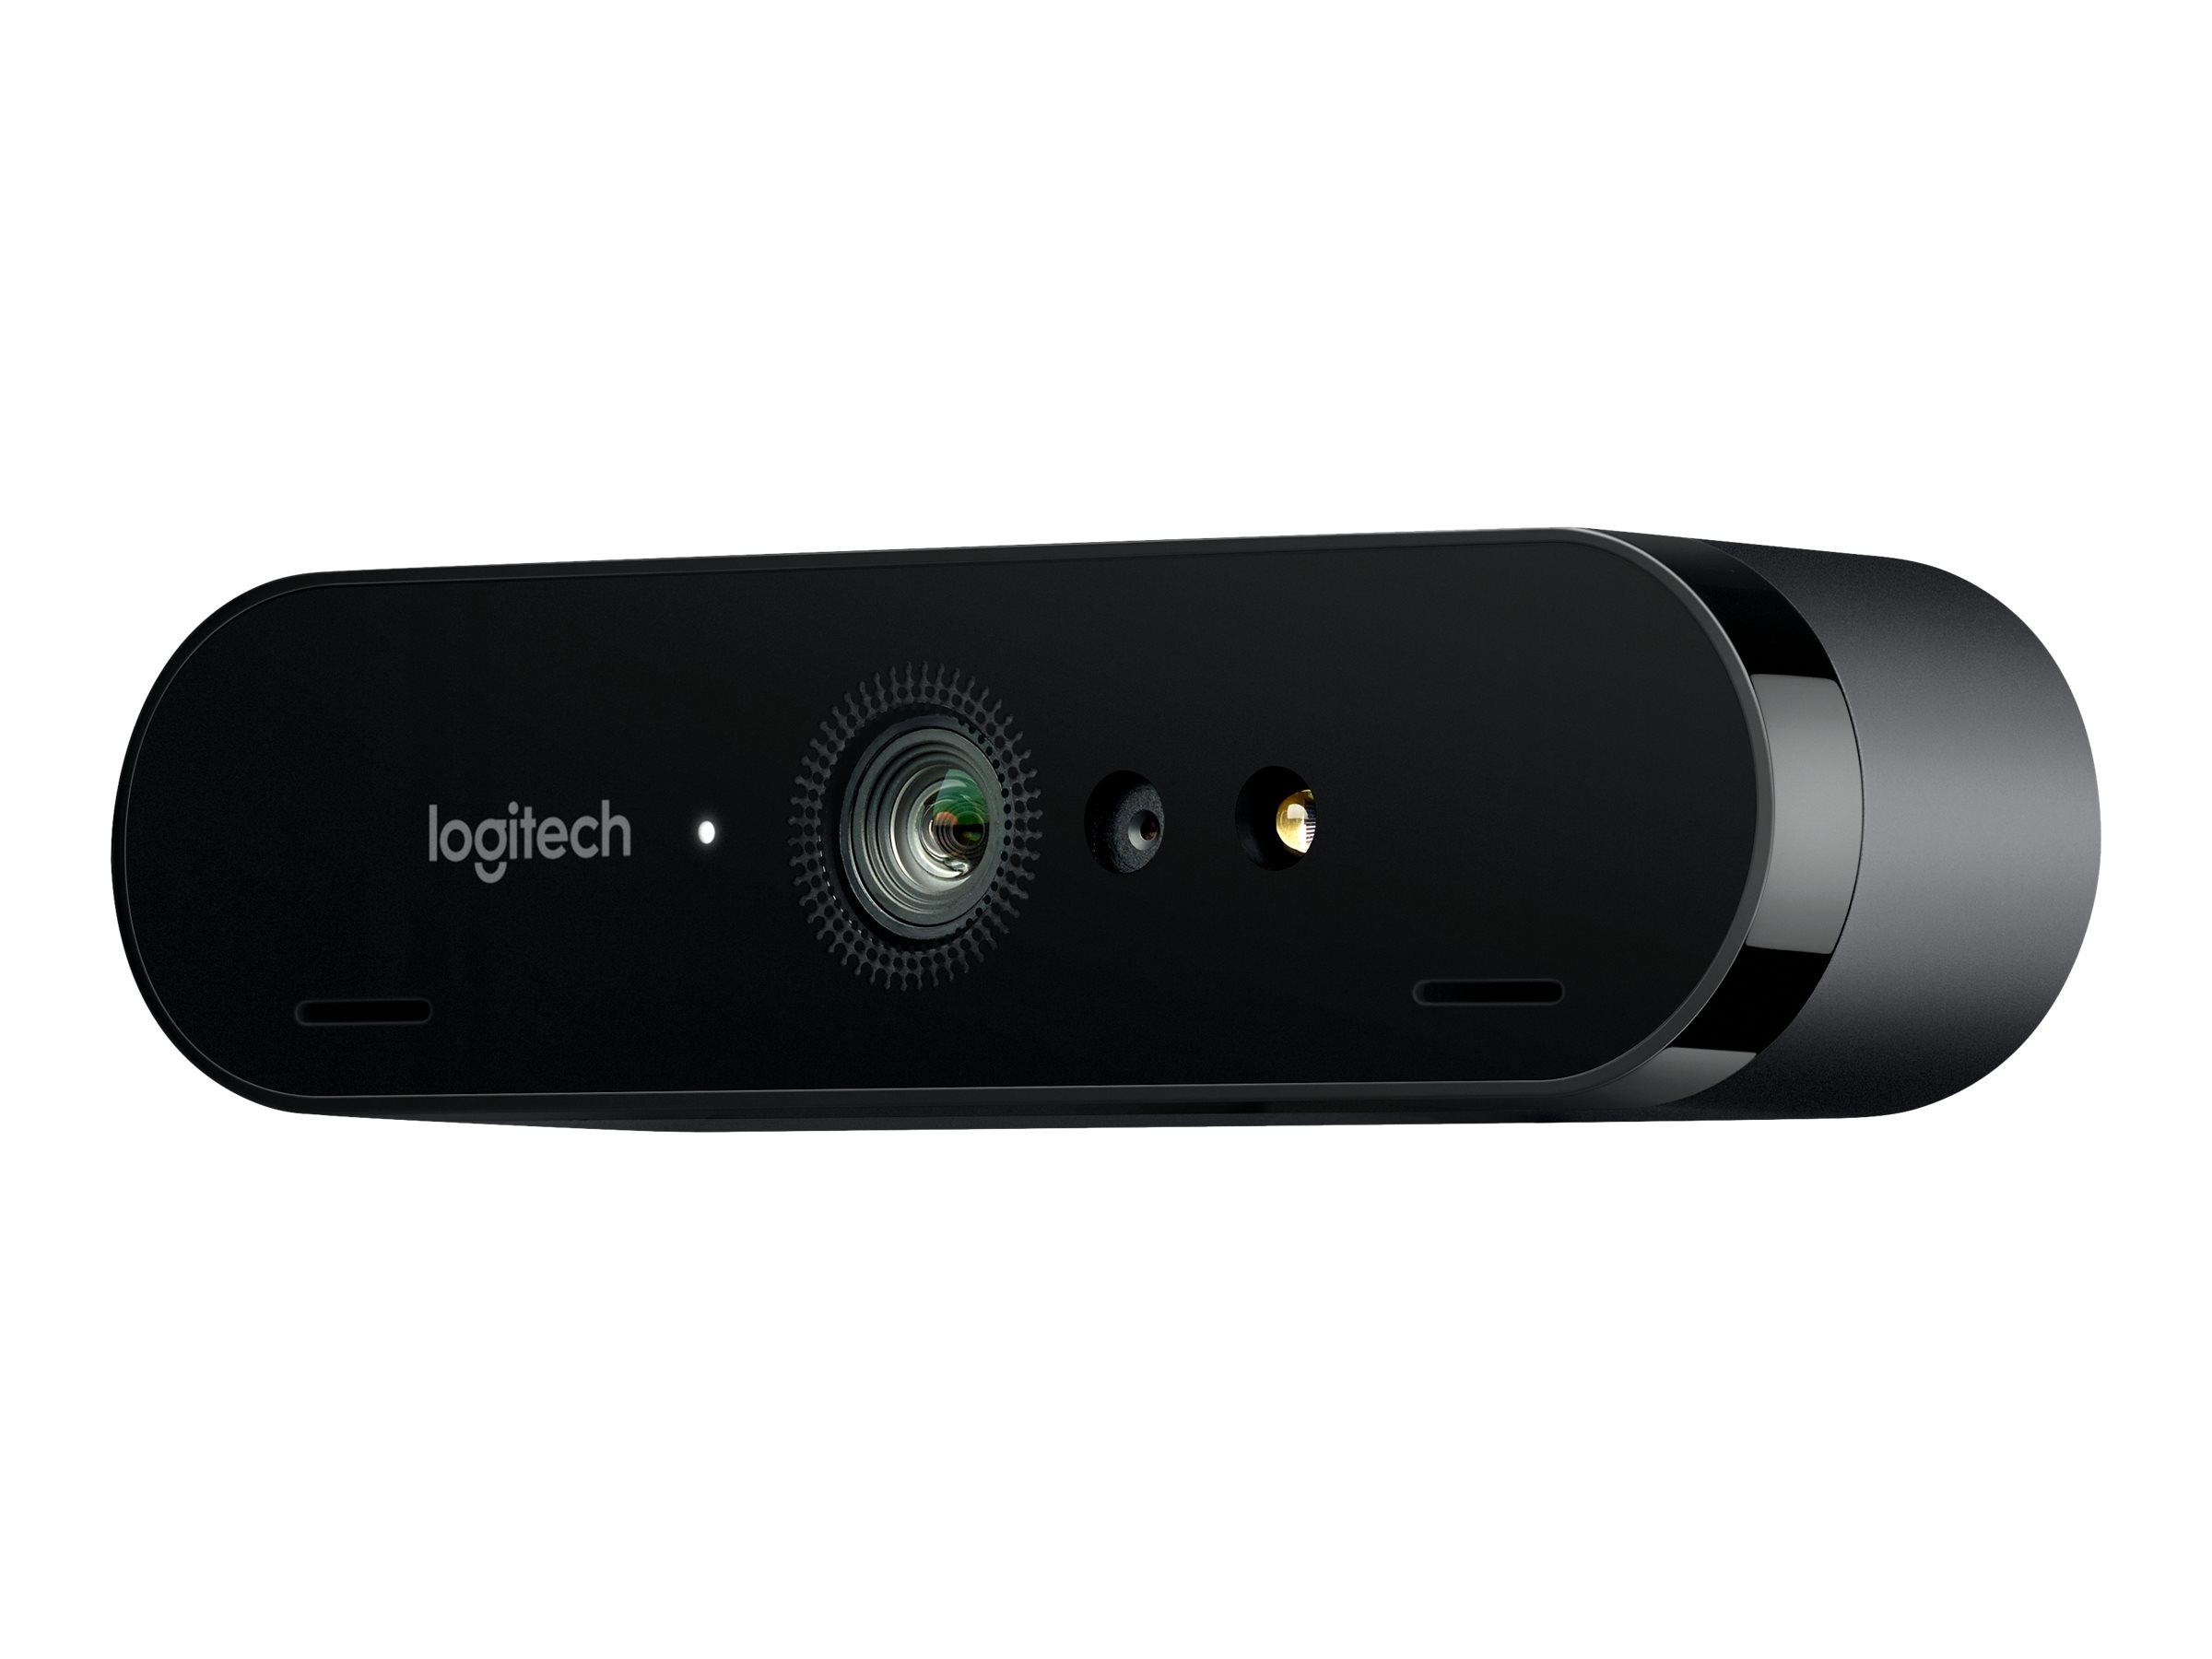 Logitech BRIO STREAM - Web-Kamera - Farbe - 4096 x 2160 - 1080p, 4K - Audio